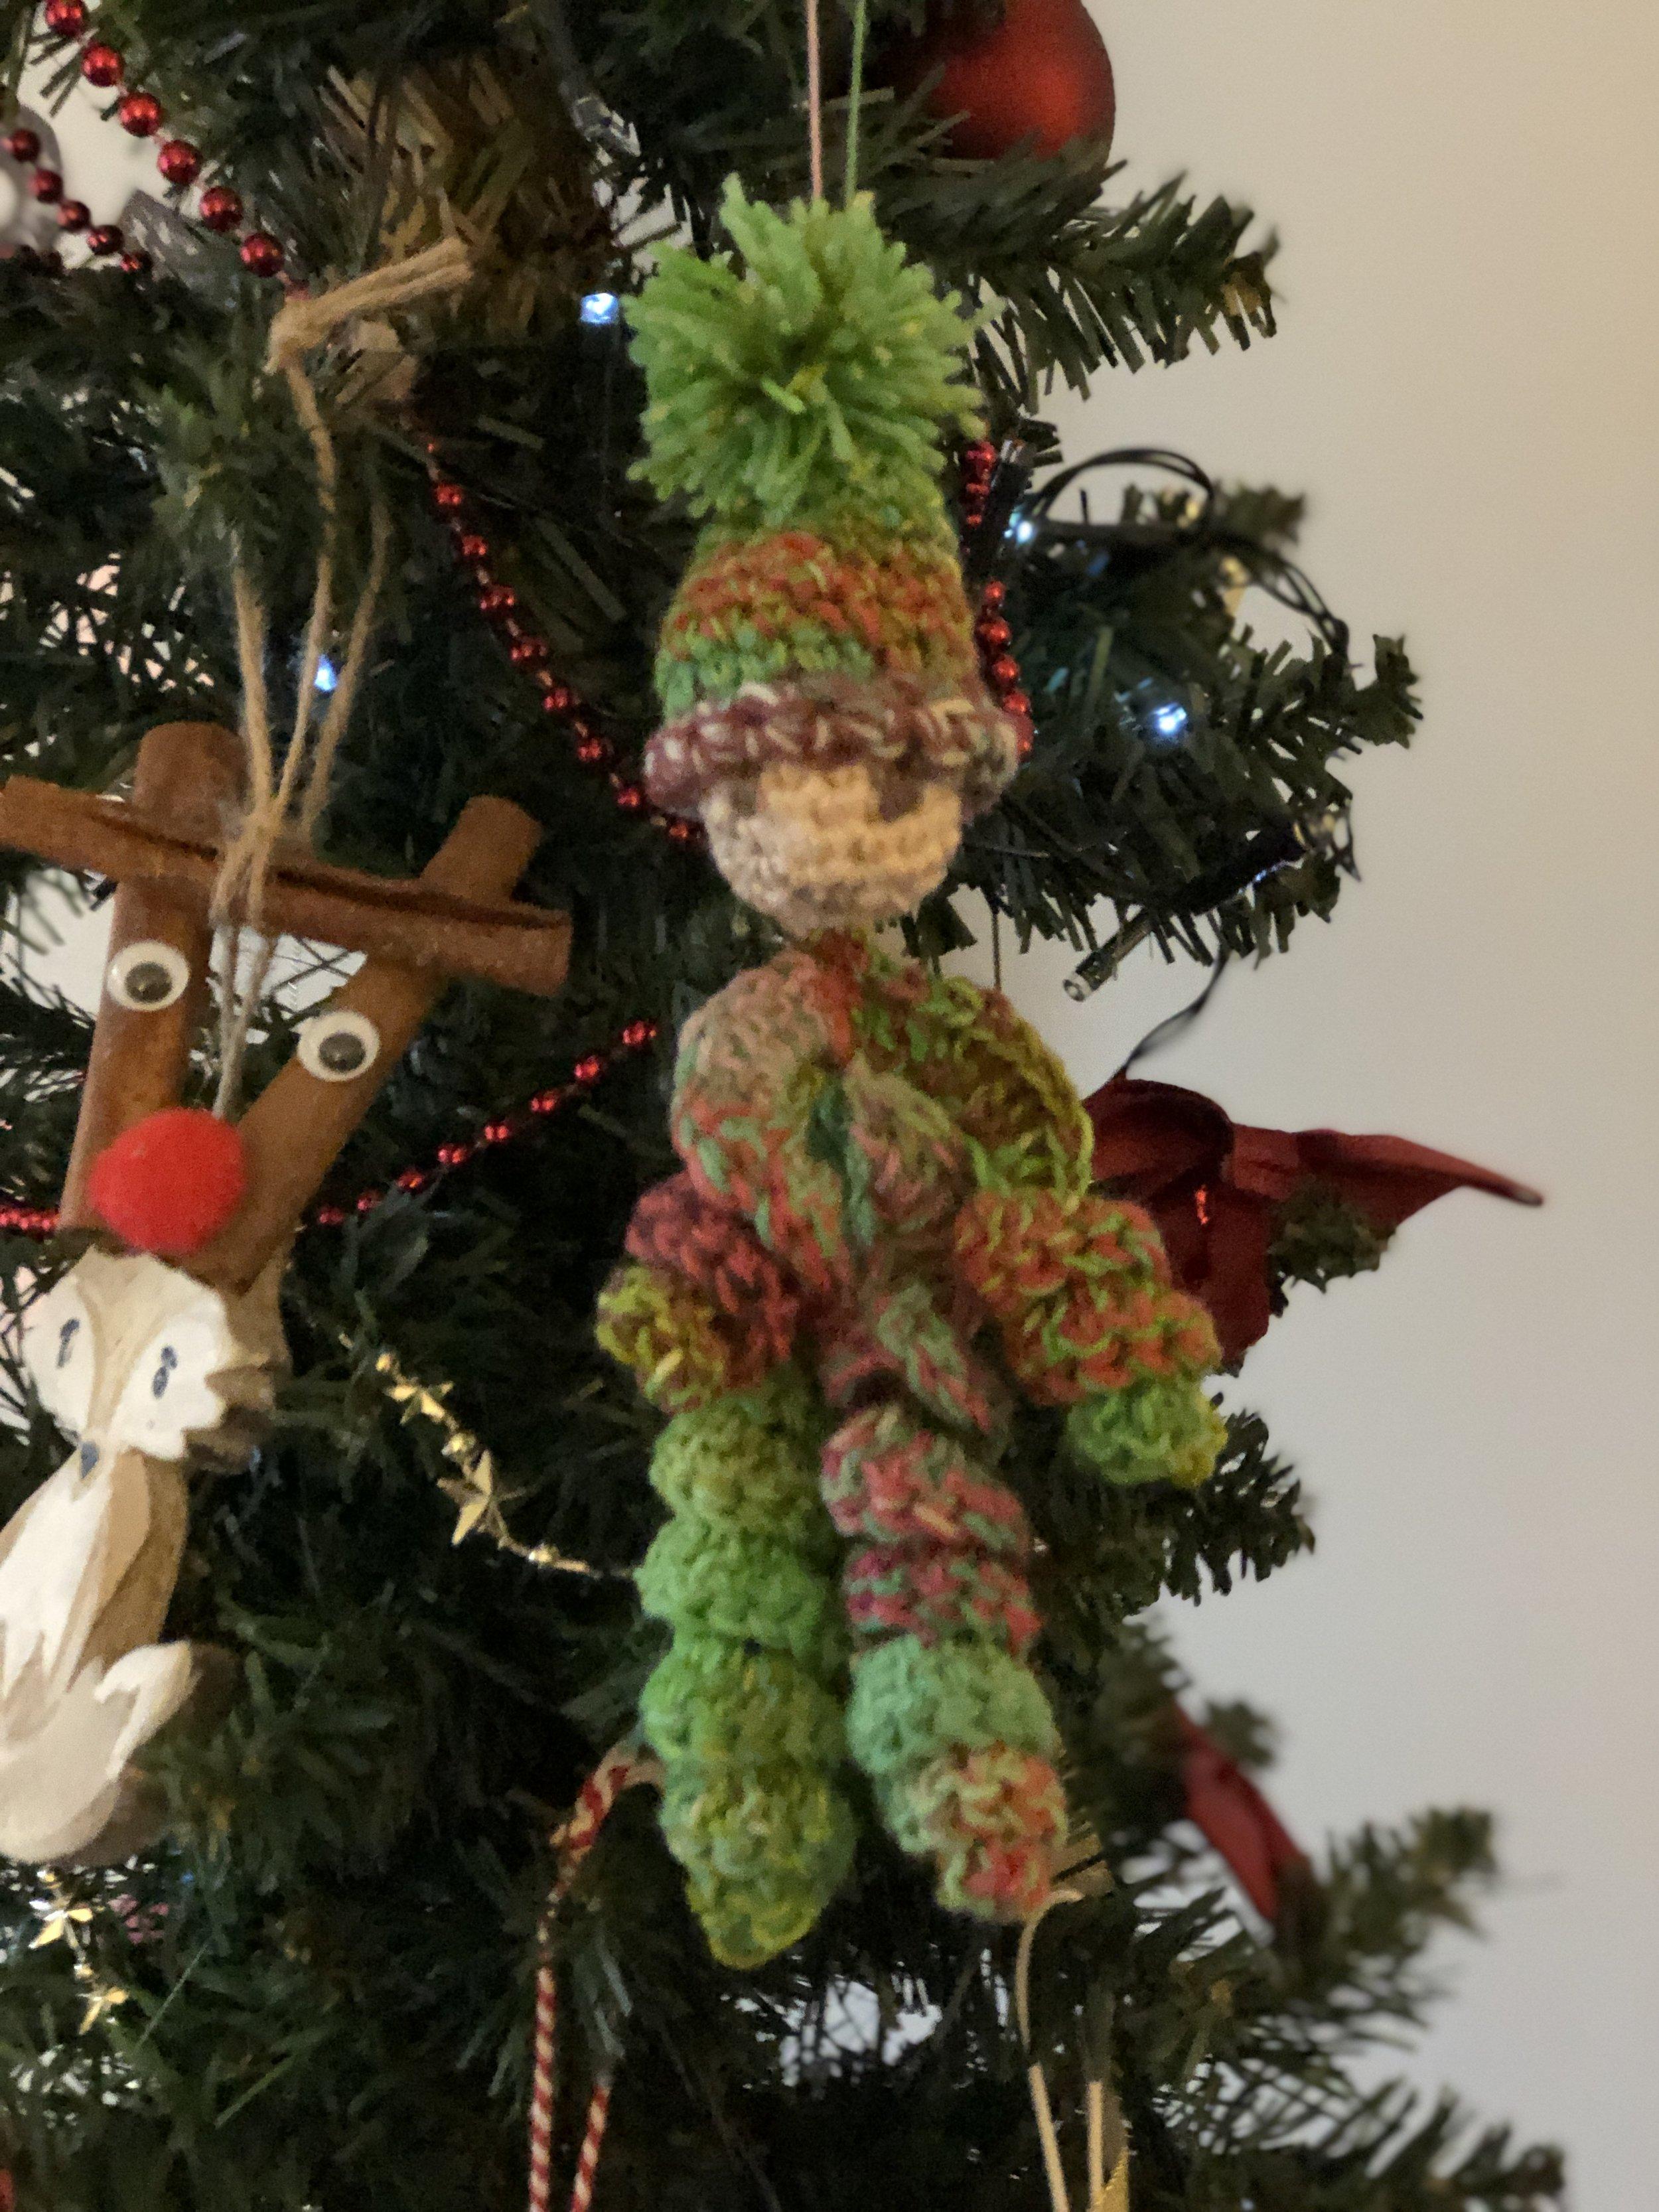 Ernie the elf